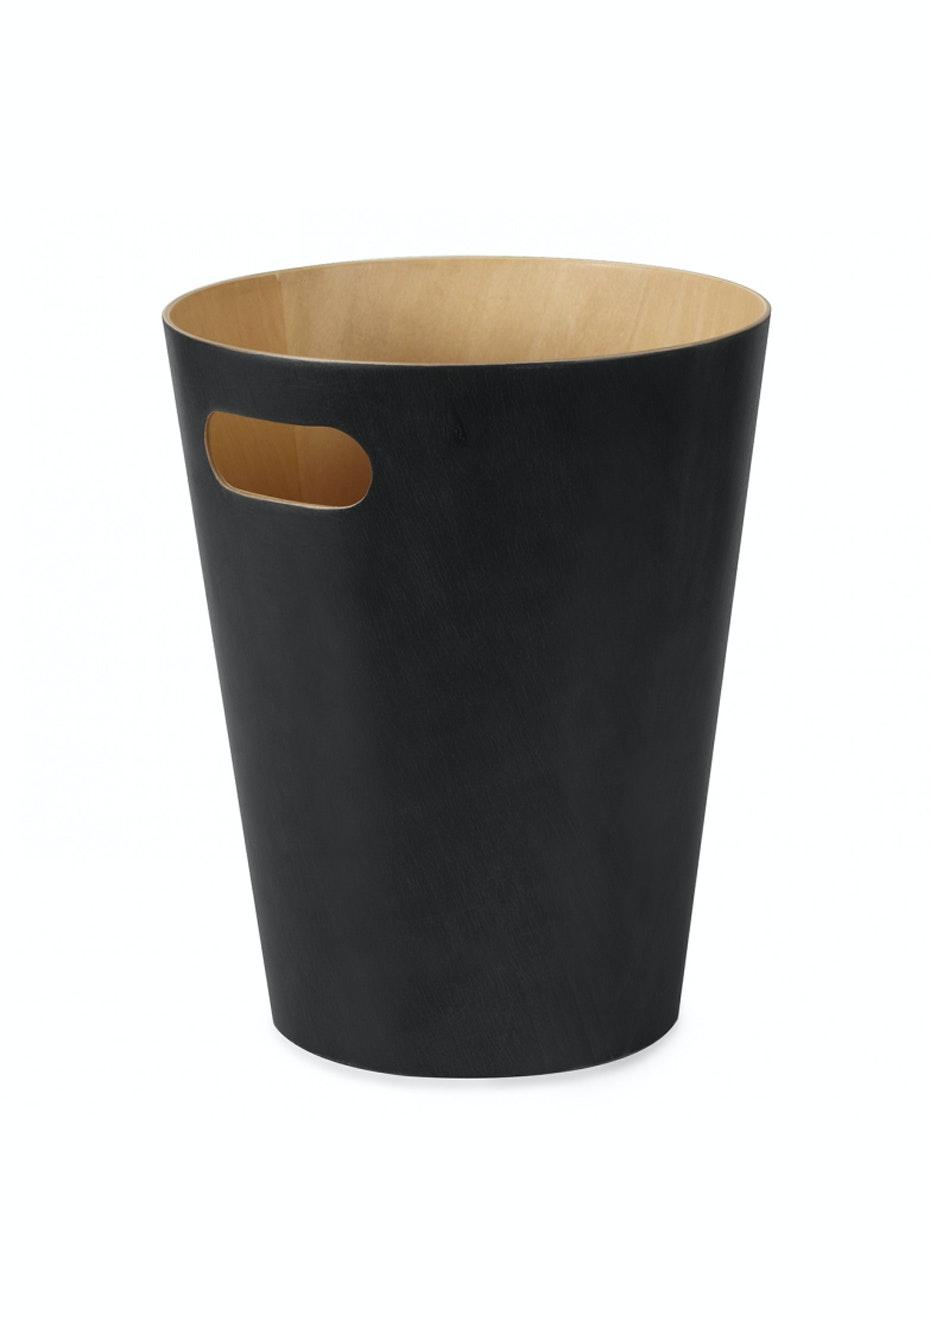 Umbra - Woodrow Can  - Black